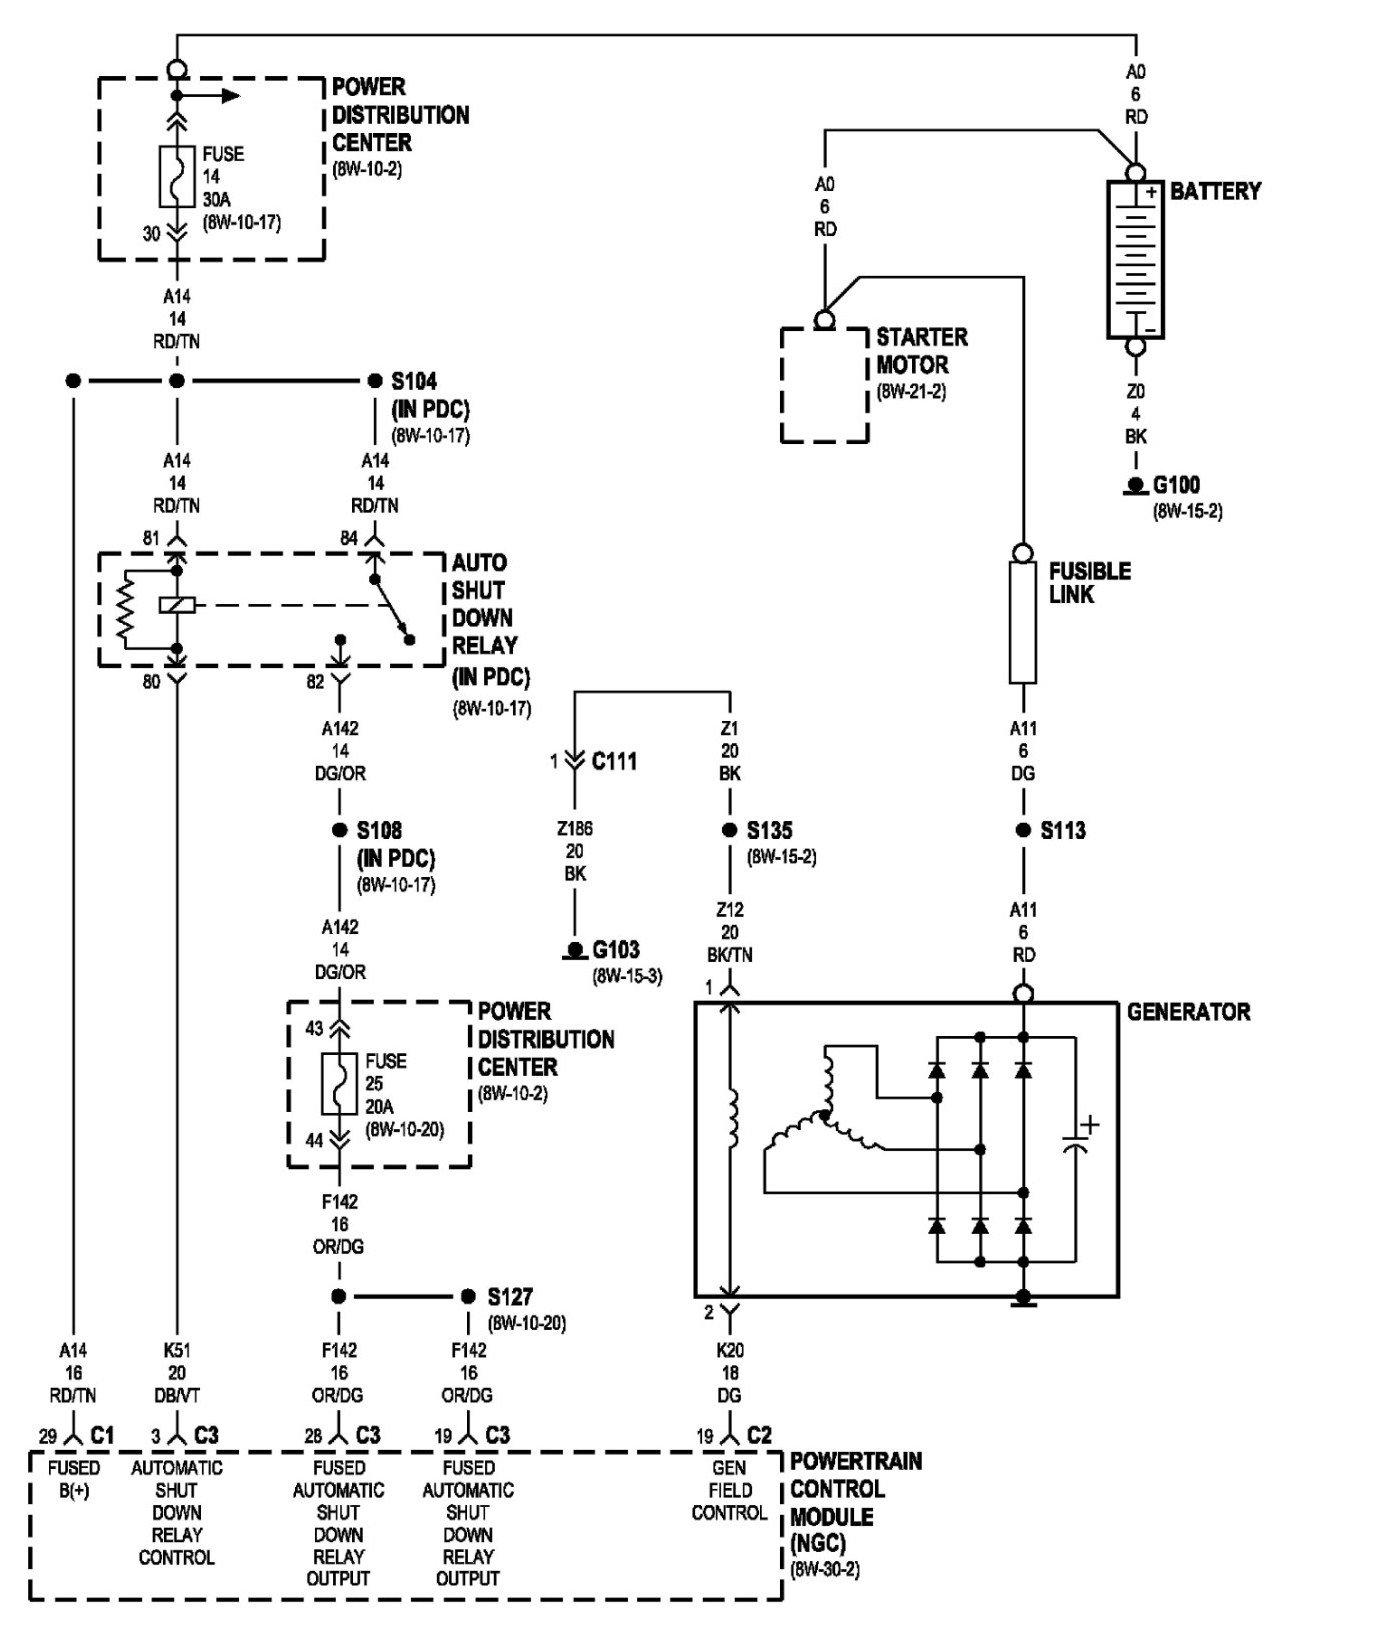 similiar sebring engine diagram keywords 2004 chrysler pacifica diagram in addition 2005 chrysler sebring door